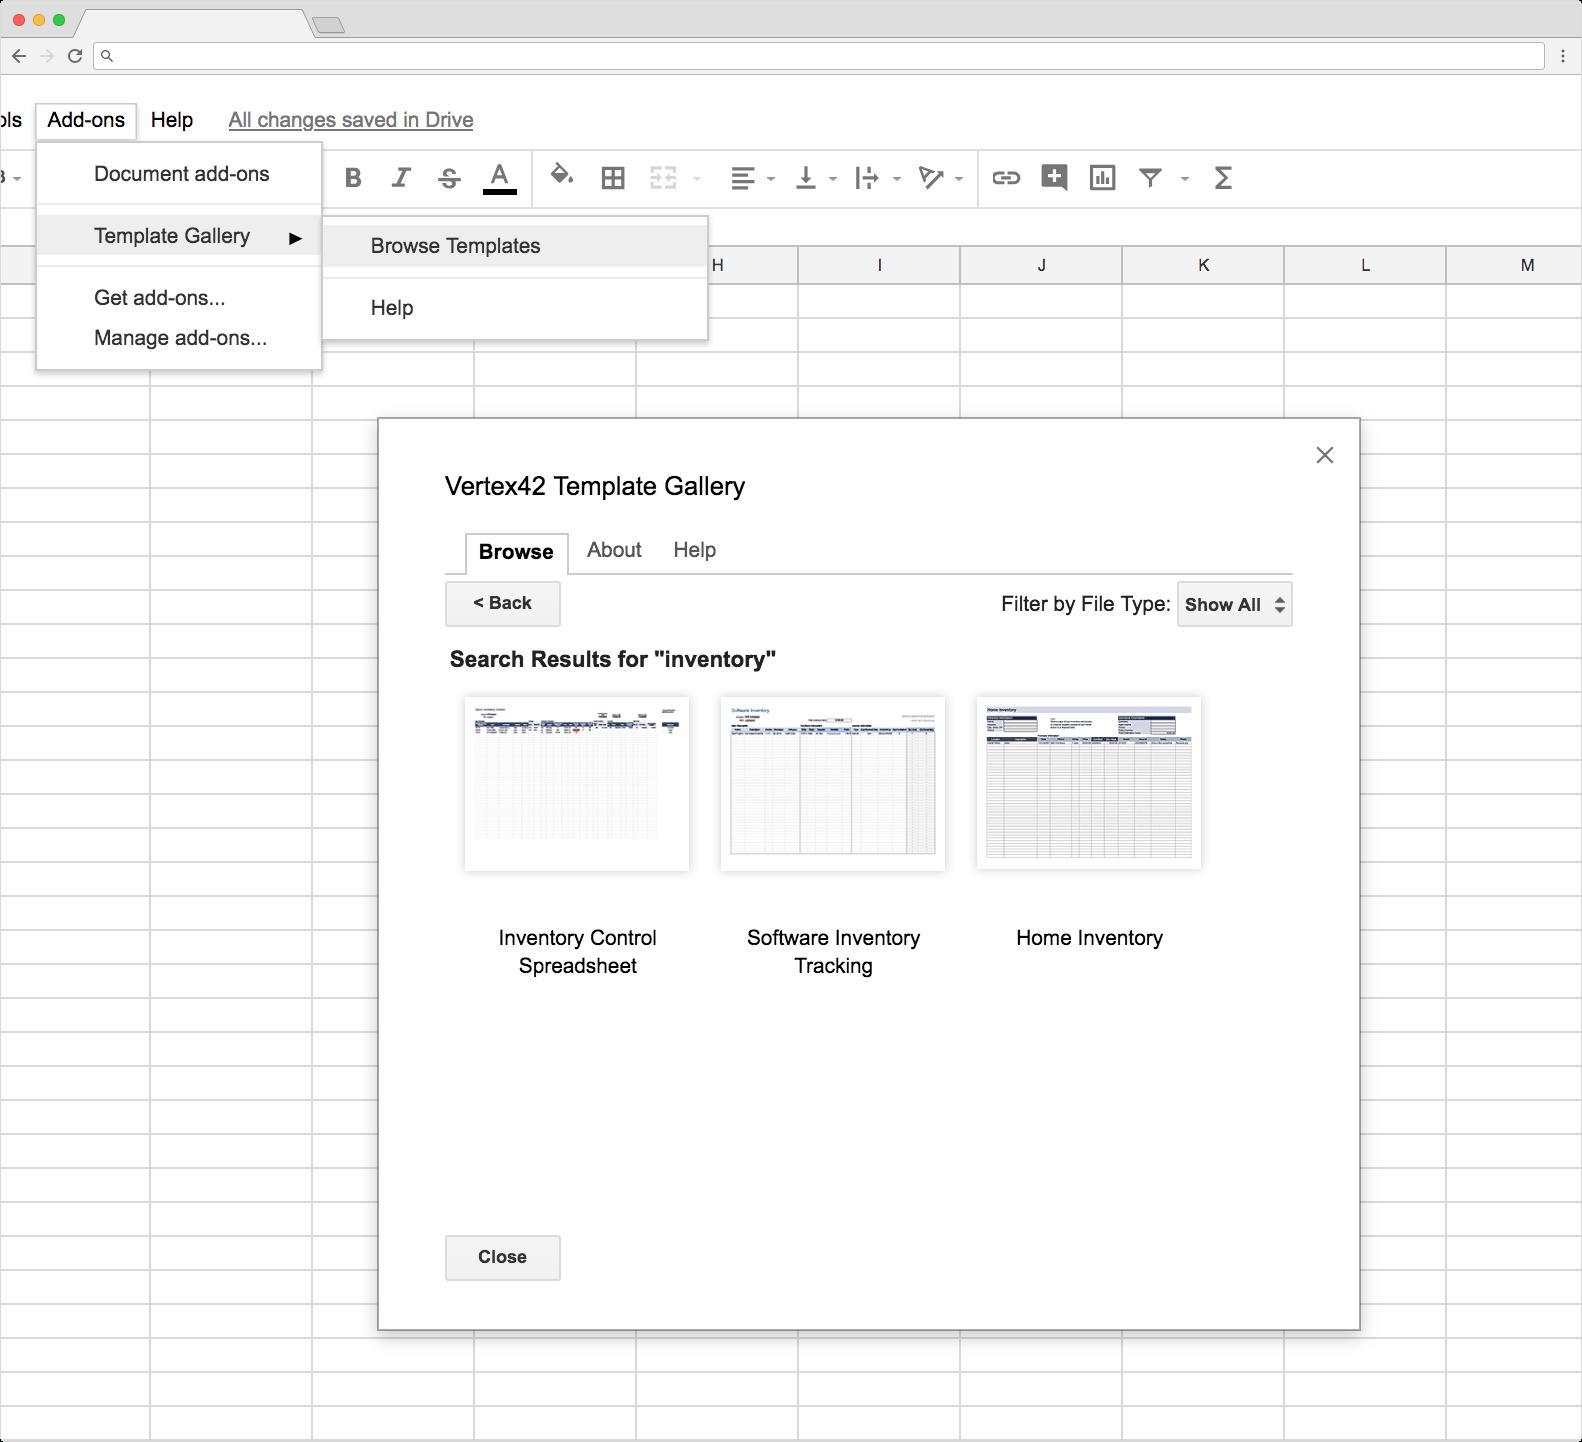 Free Inventory Spreadsheet Template Google Sheets Throughout Top 5 Free Google Sheets Inventory Templates · Blog Sheetgo